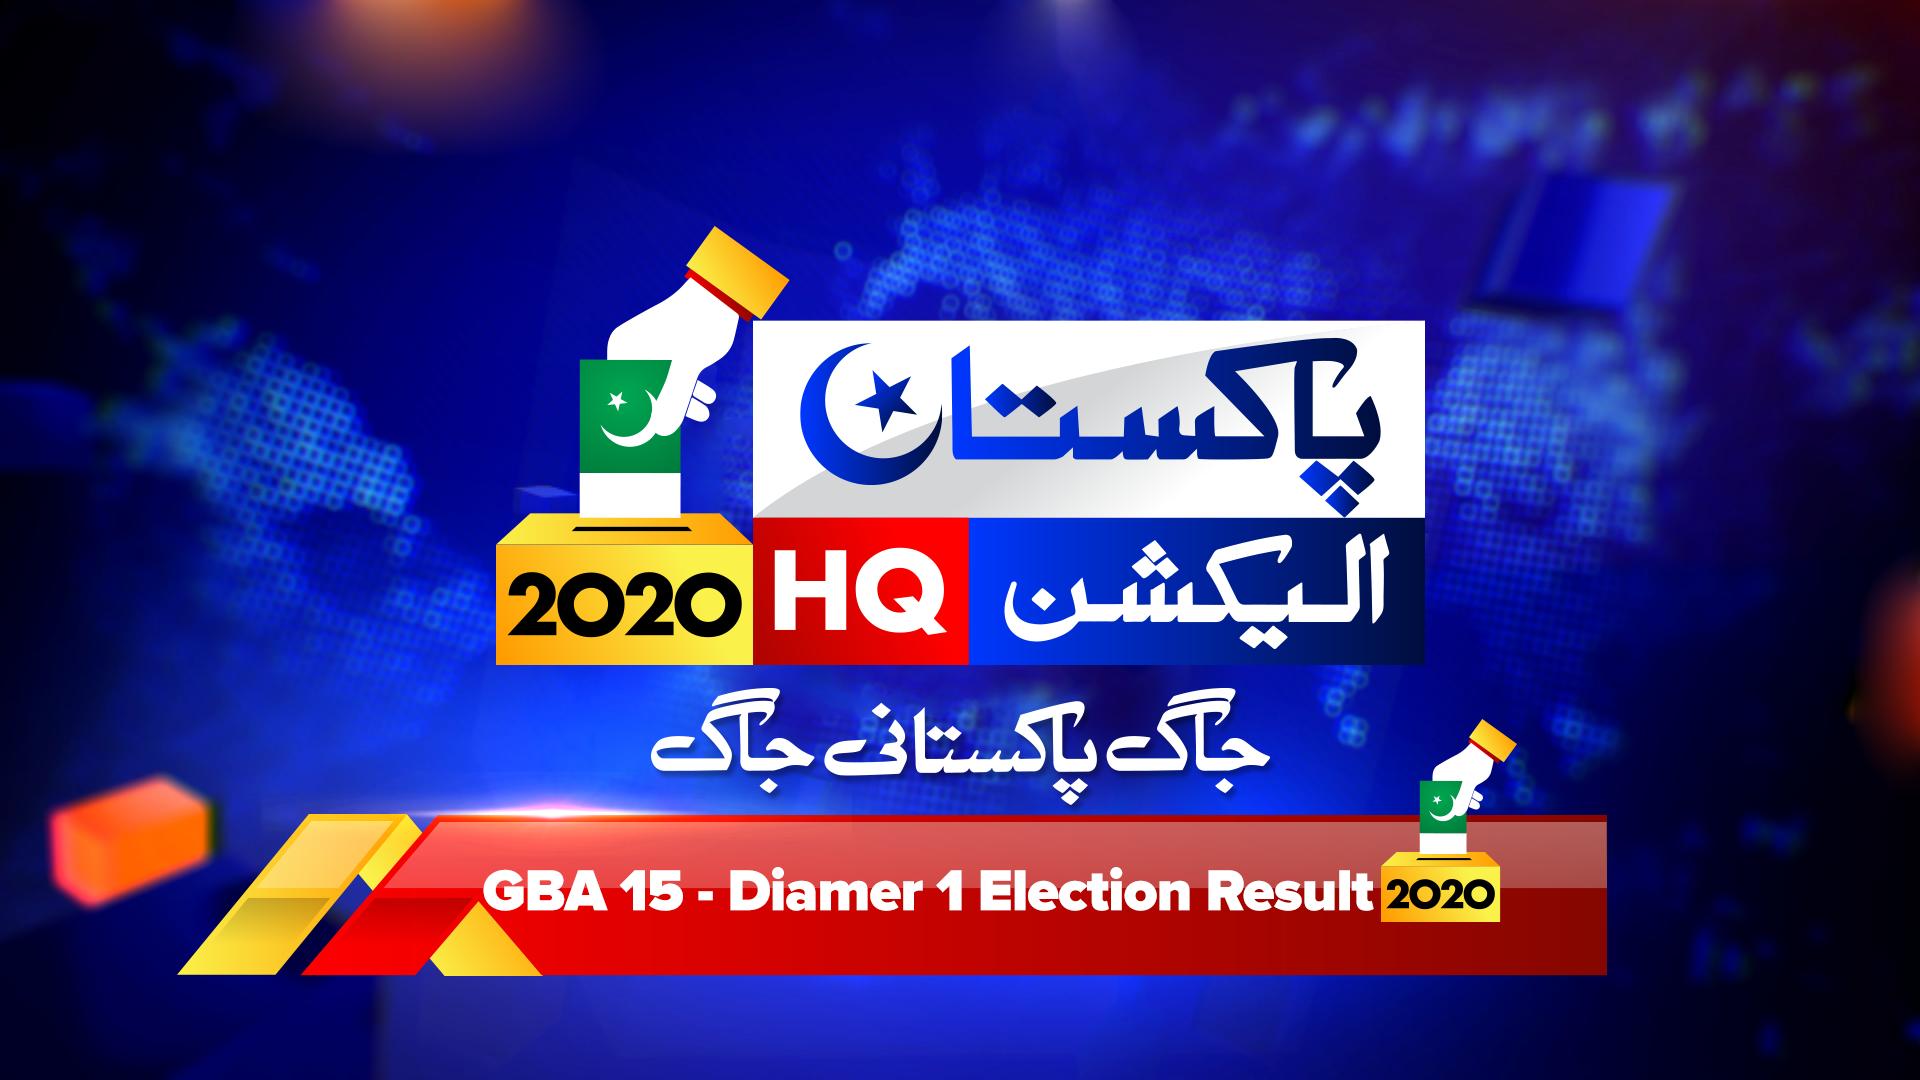 Gilgit Baltistan Election Result 2020